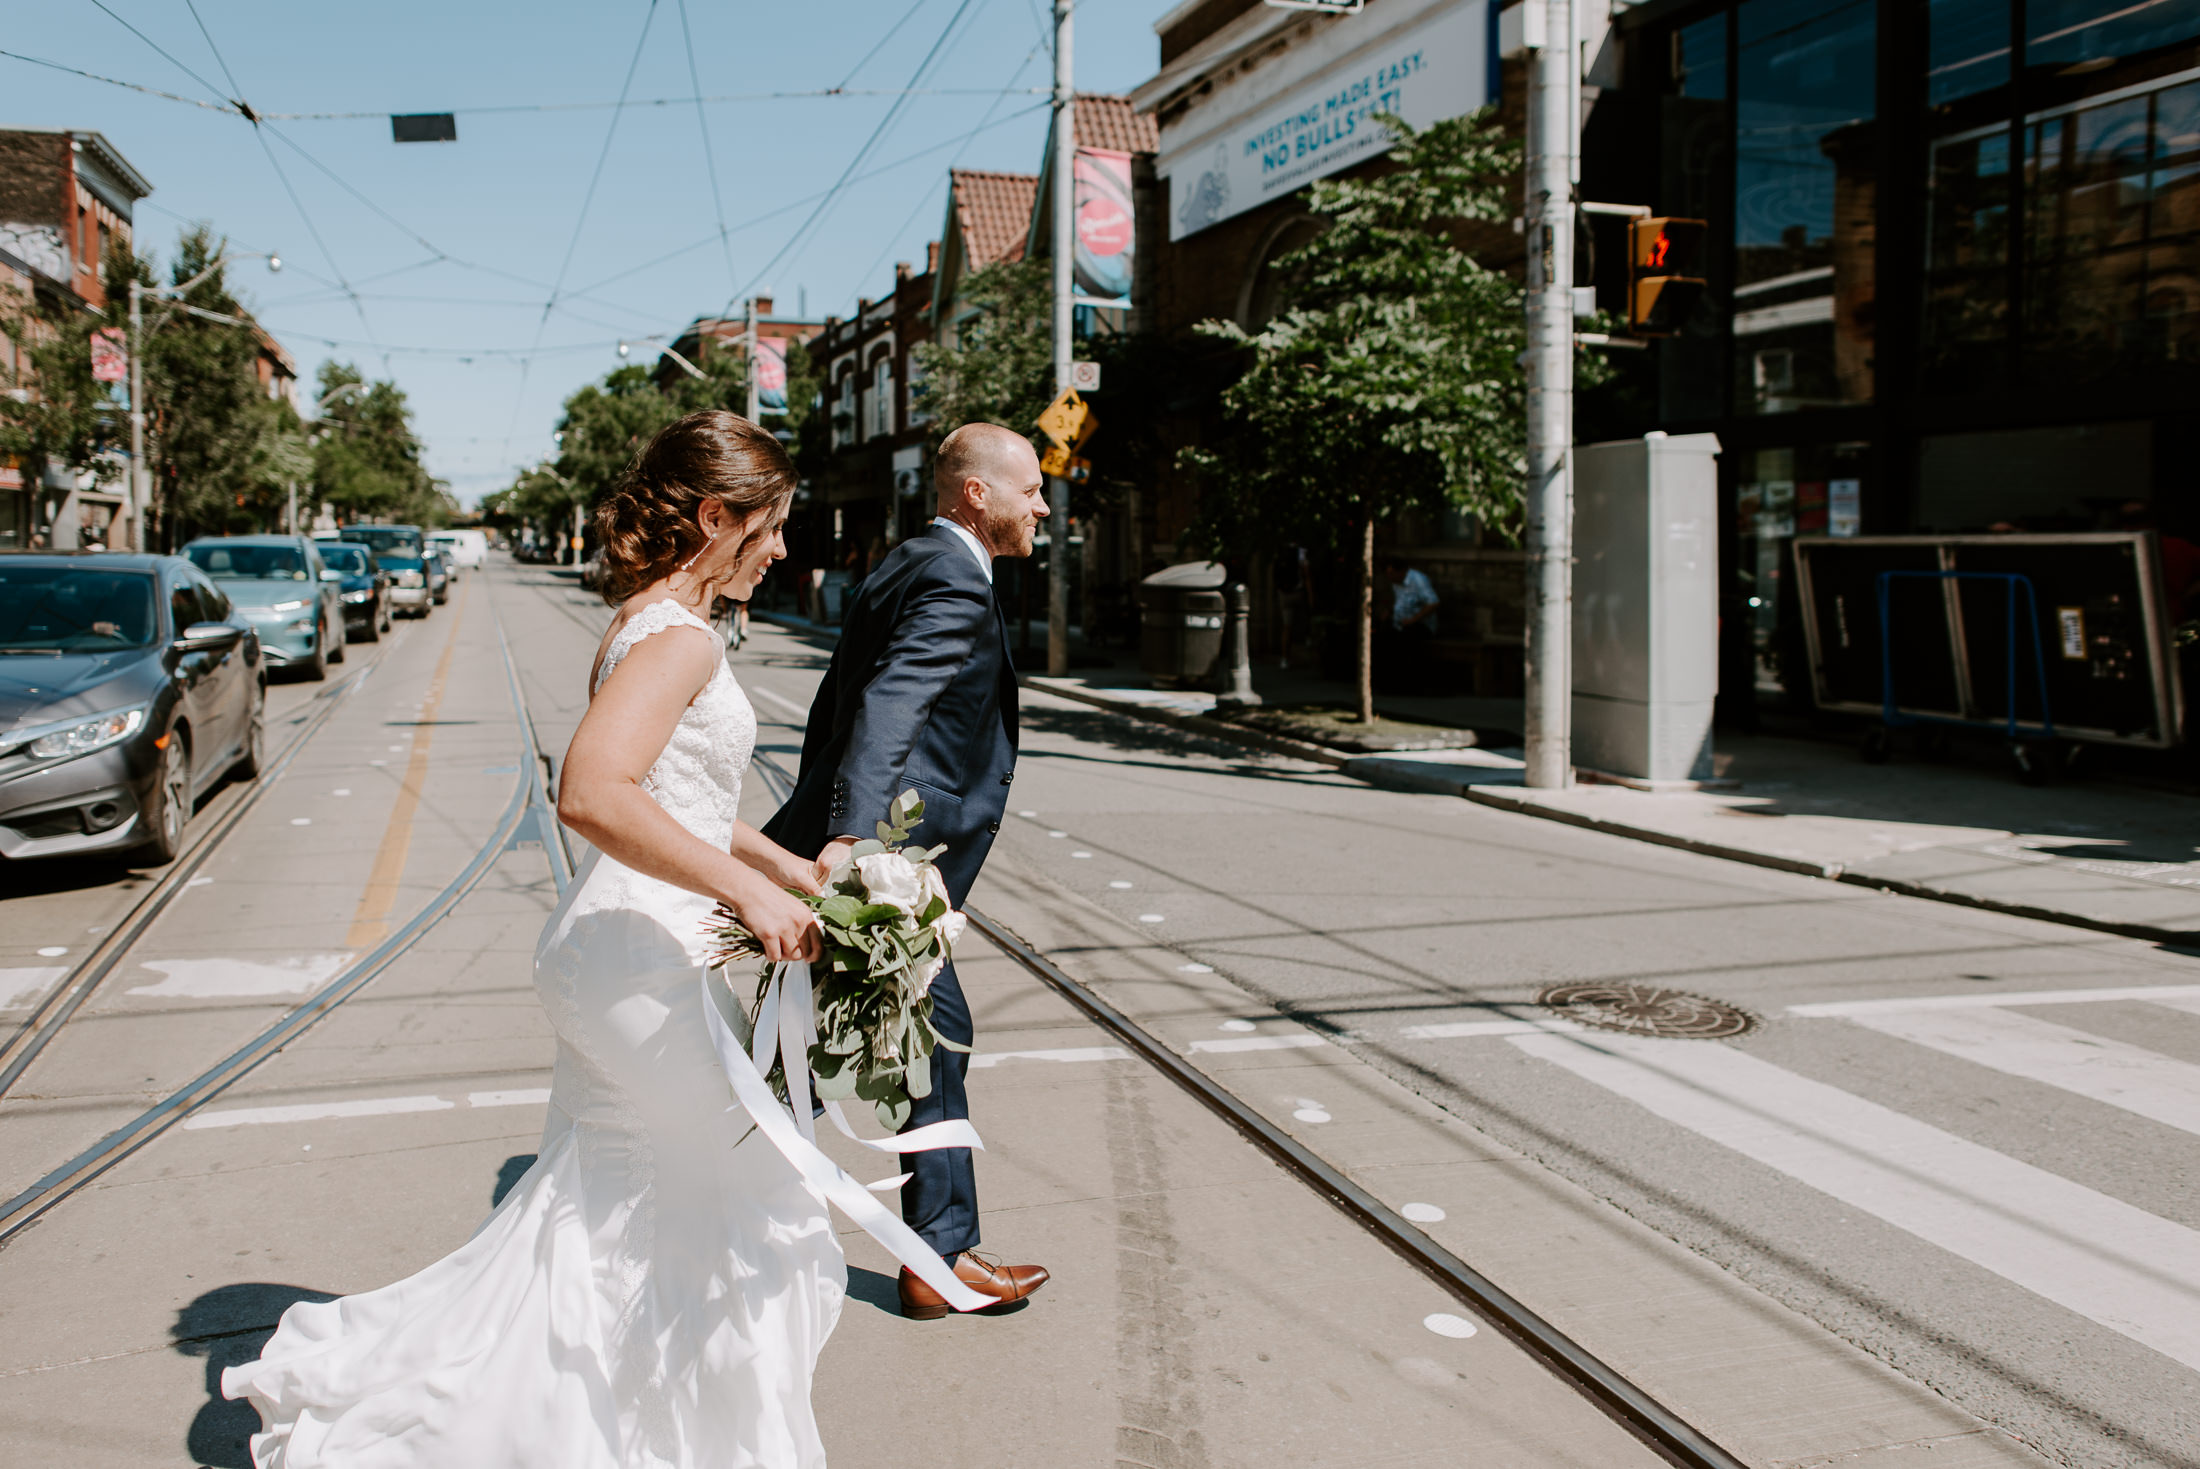 Bride and Groom running across the street